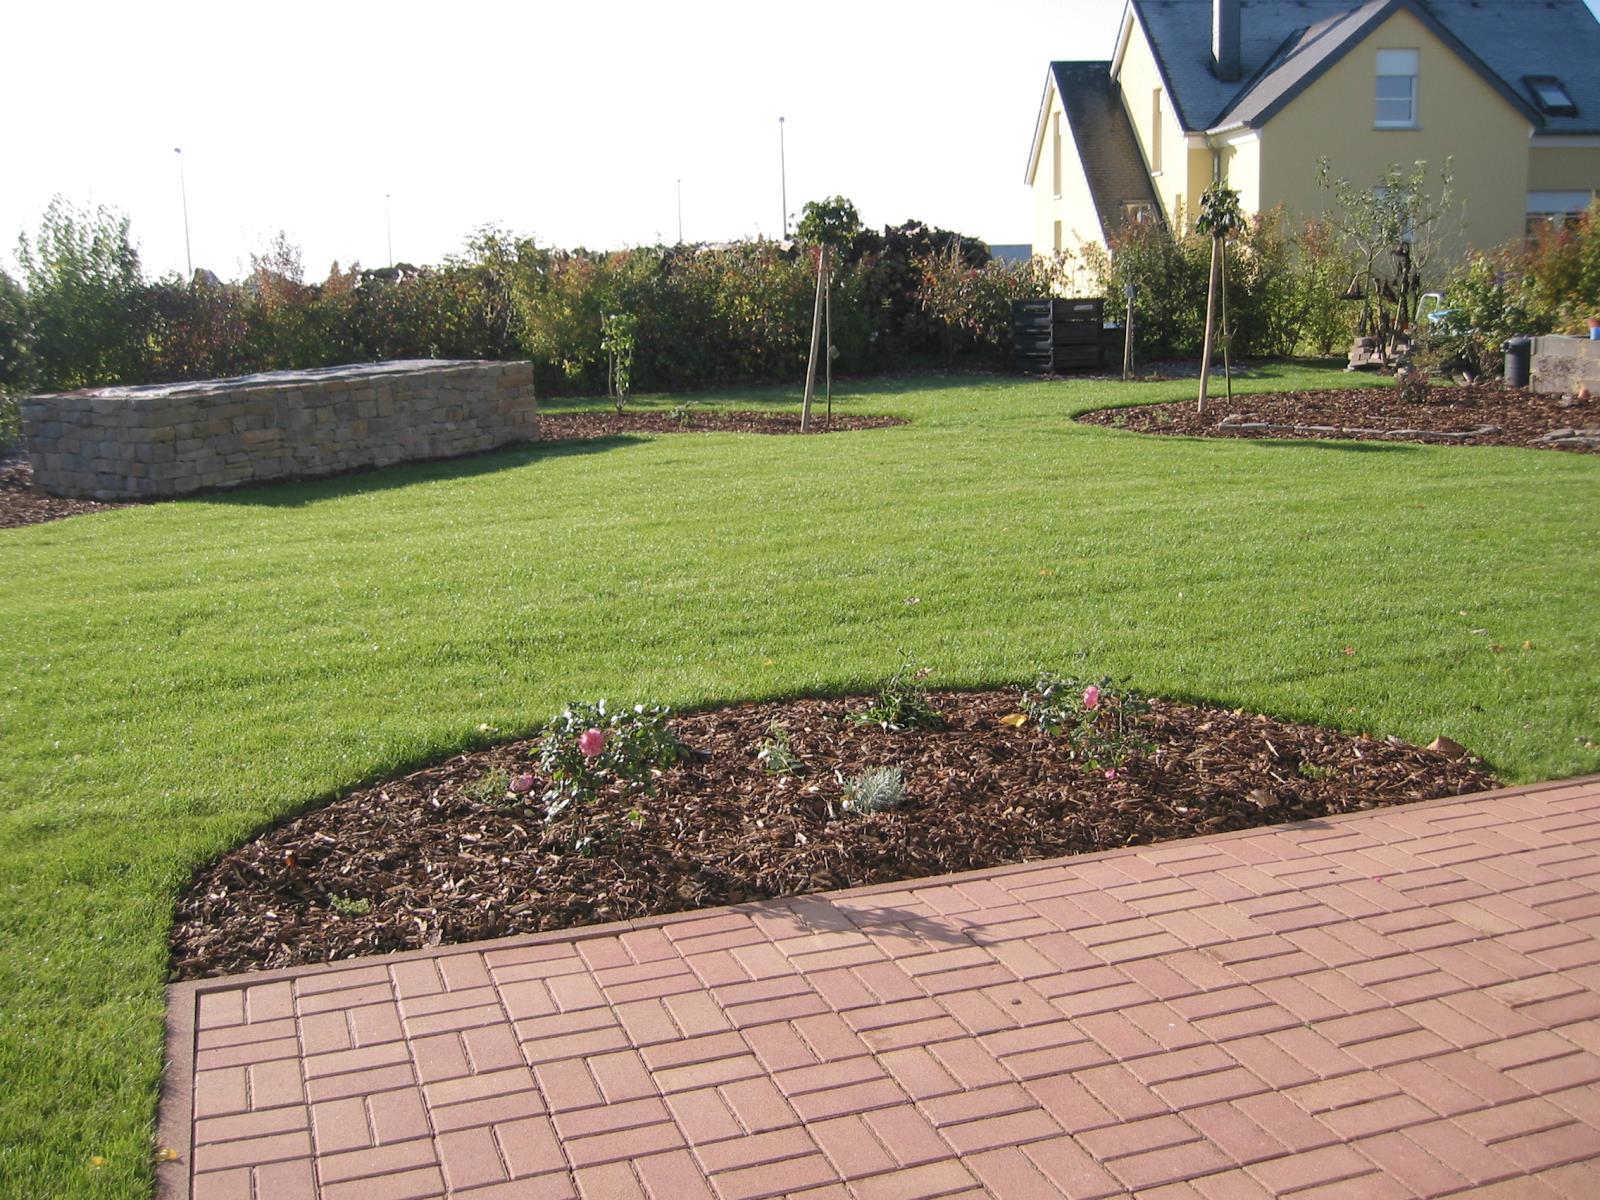 Jardin du soleil hedge trimmer gardening services editus for Jardin soleil